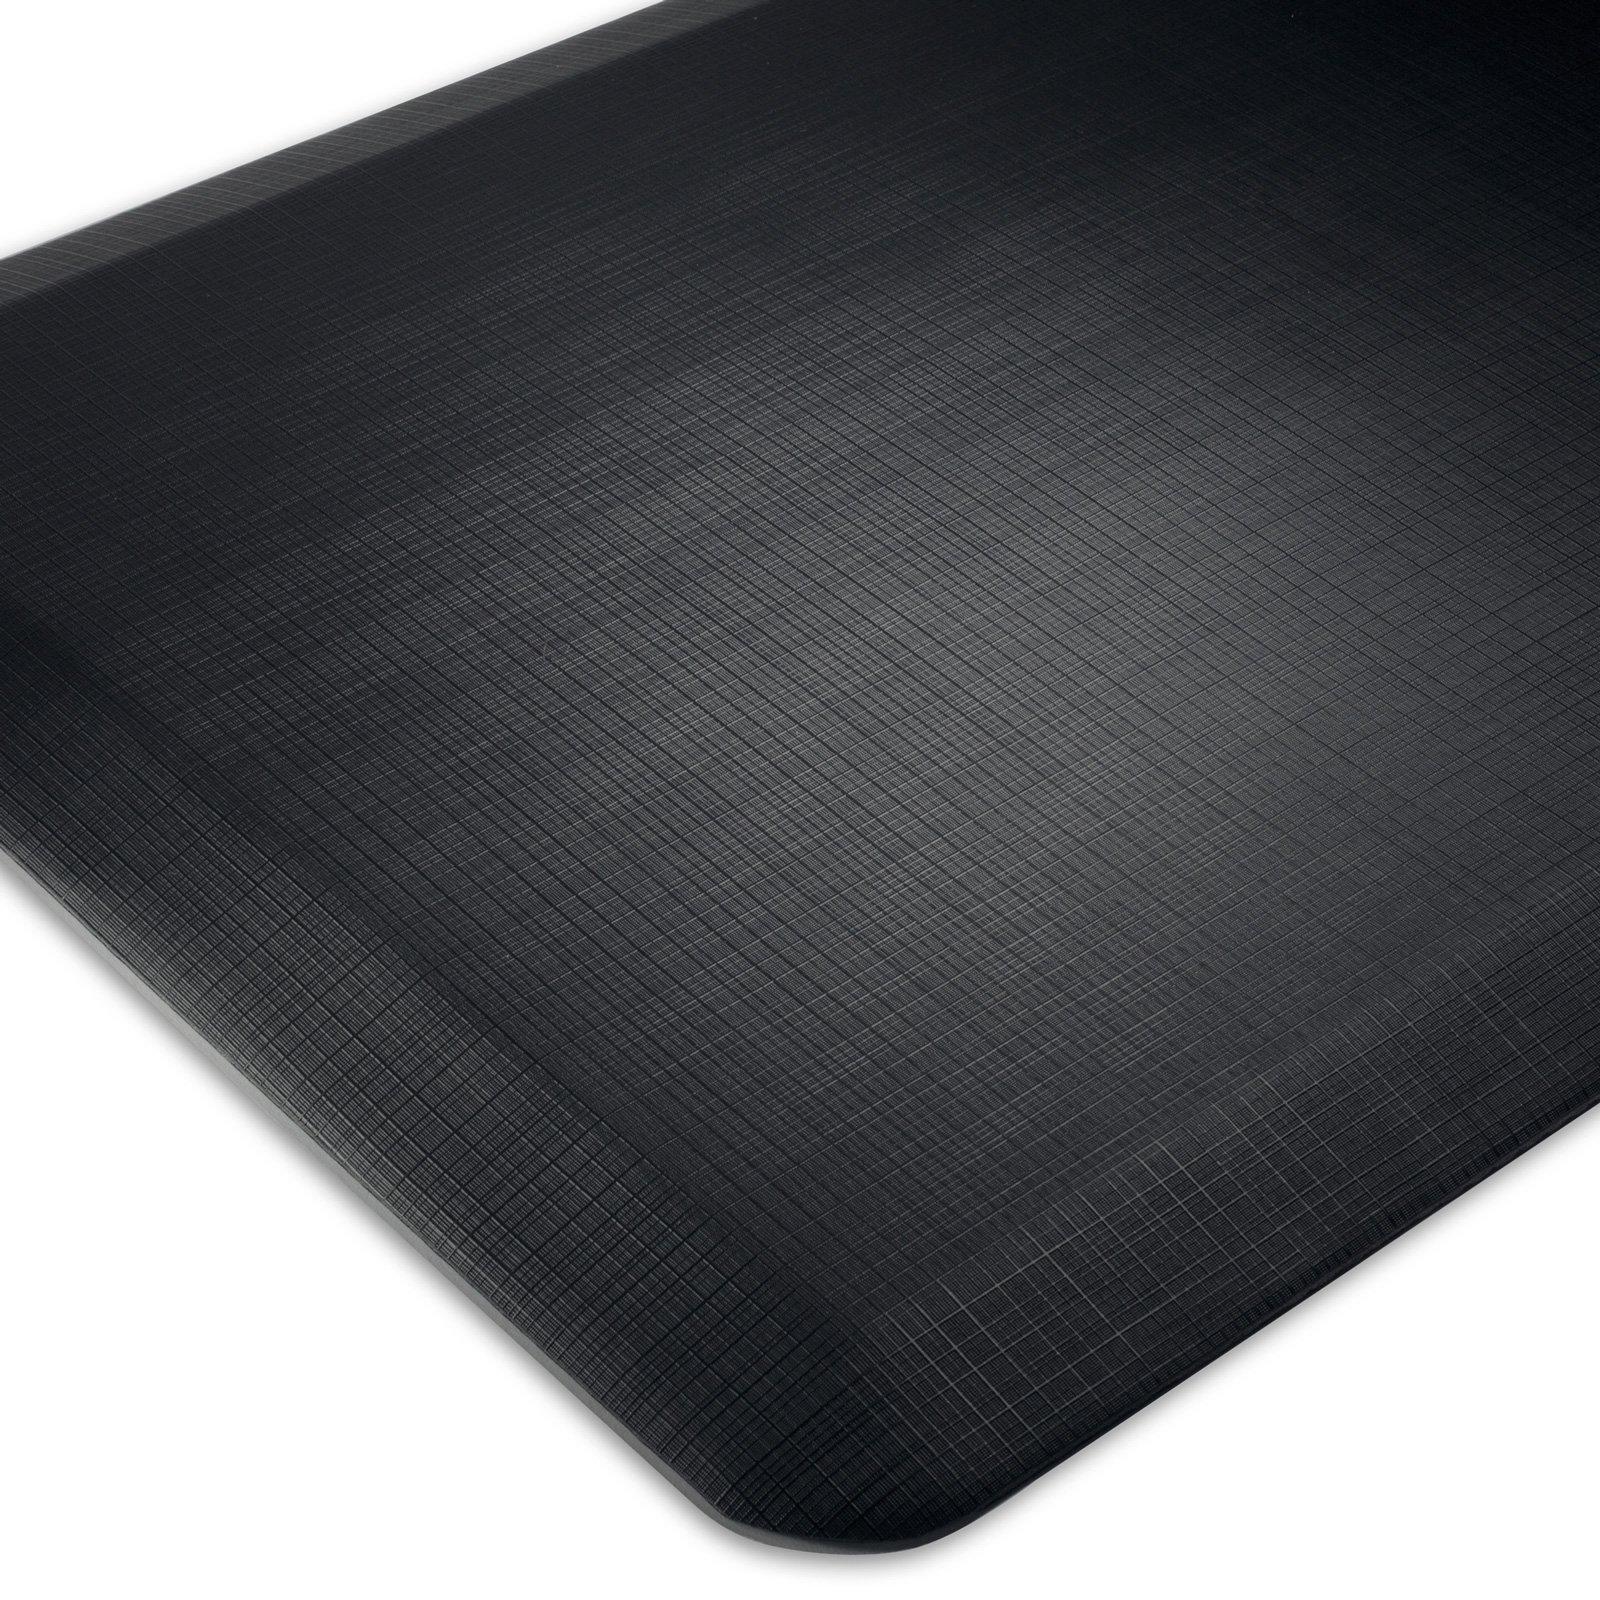 interlocking anti of runner floor walmart fatigue decorative for costco full startling kitchen amazon comfort mats size gel